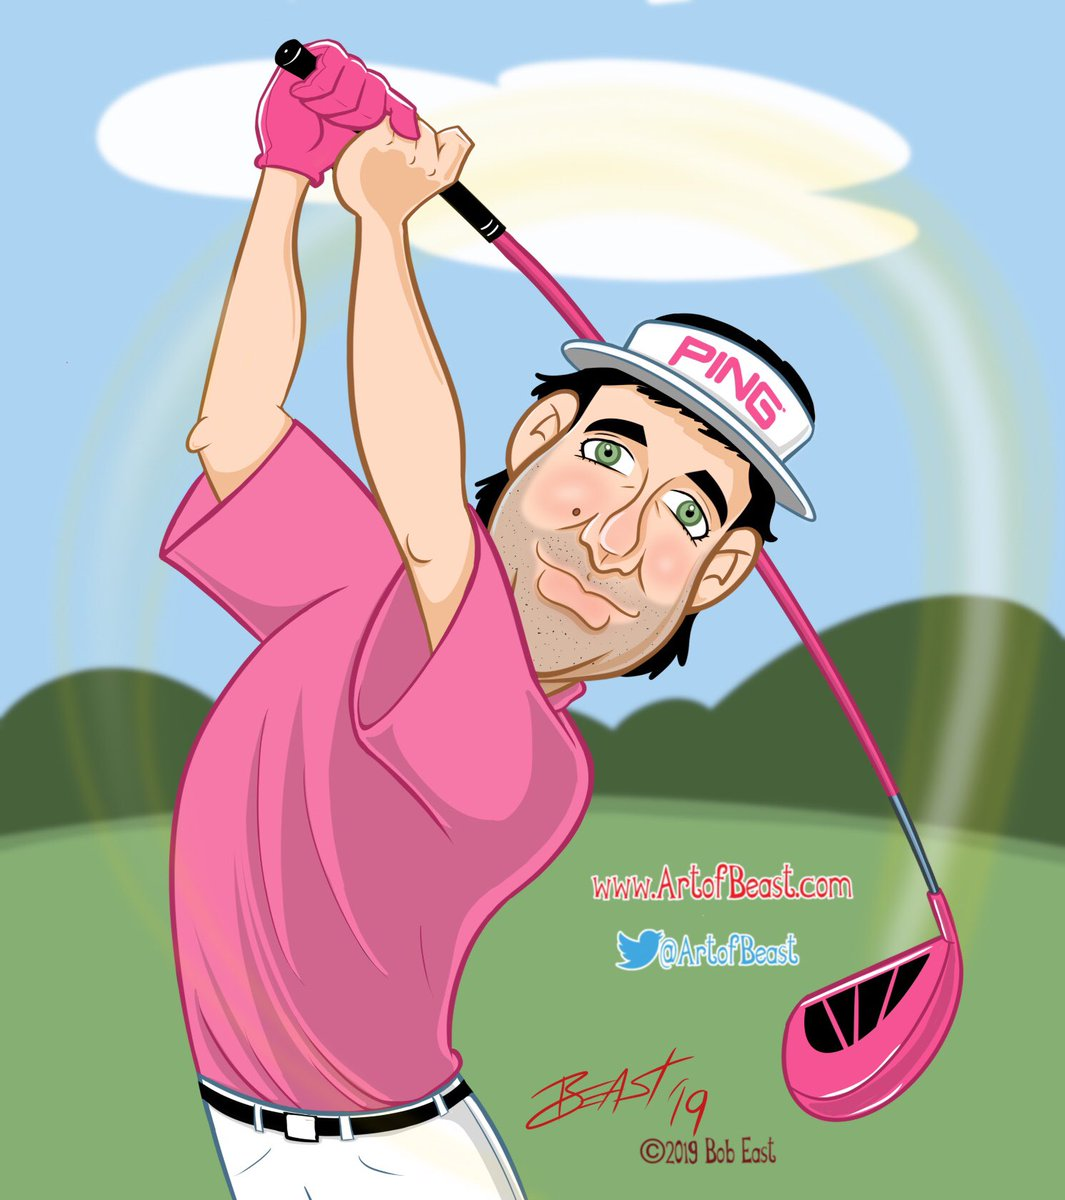 Bubba Watson caricature. @bubbawatson @PGATOUR @TheMasters #golf #caricature https://t.co/enjpuwhJby